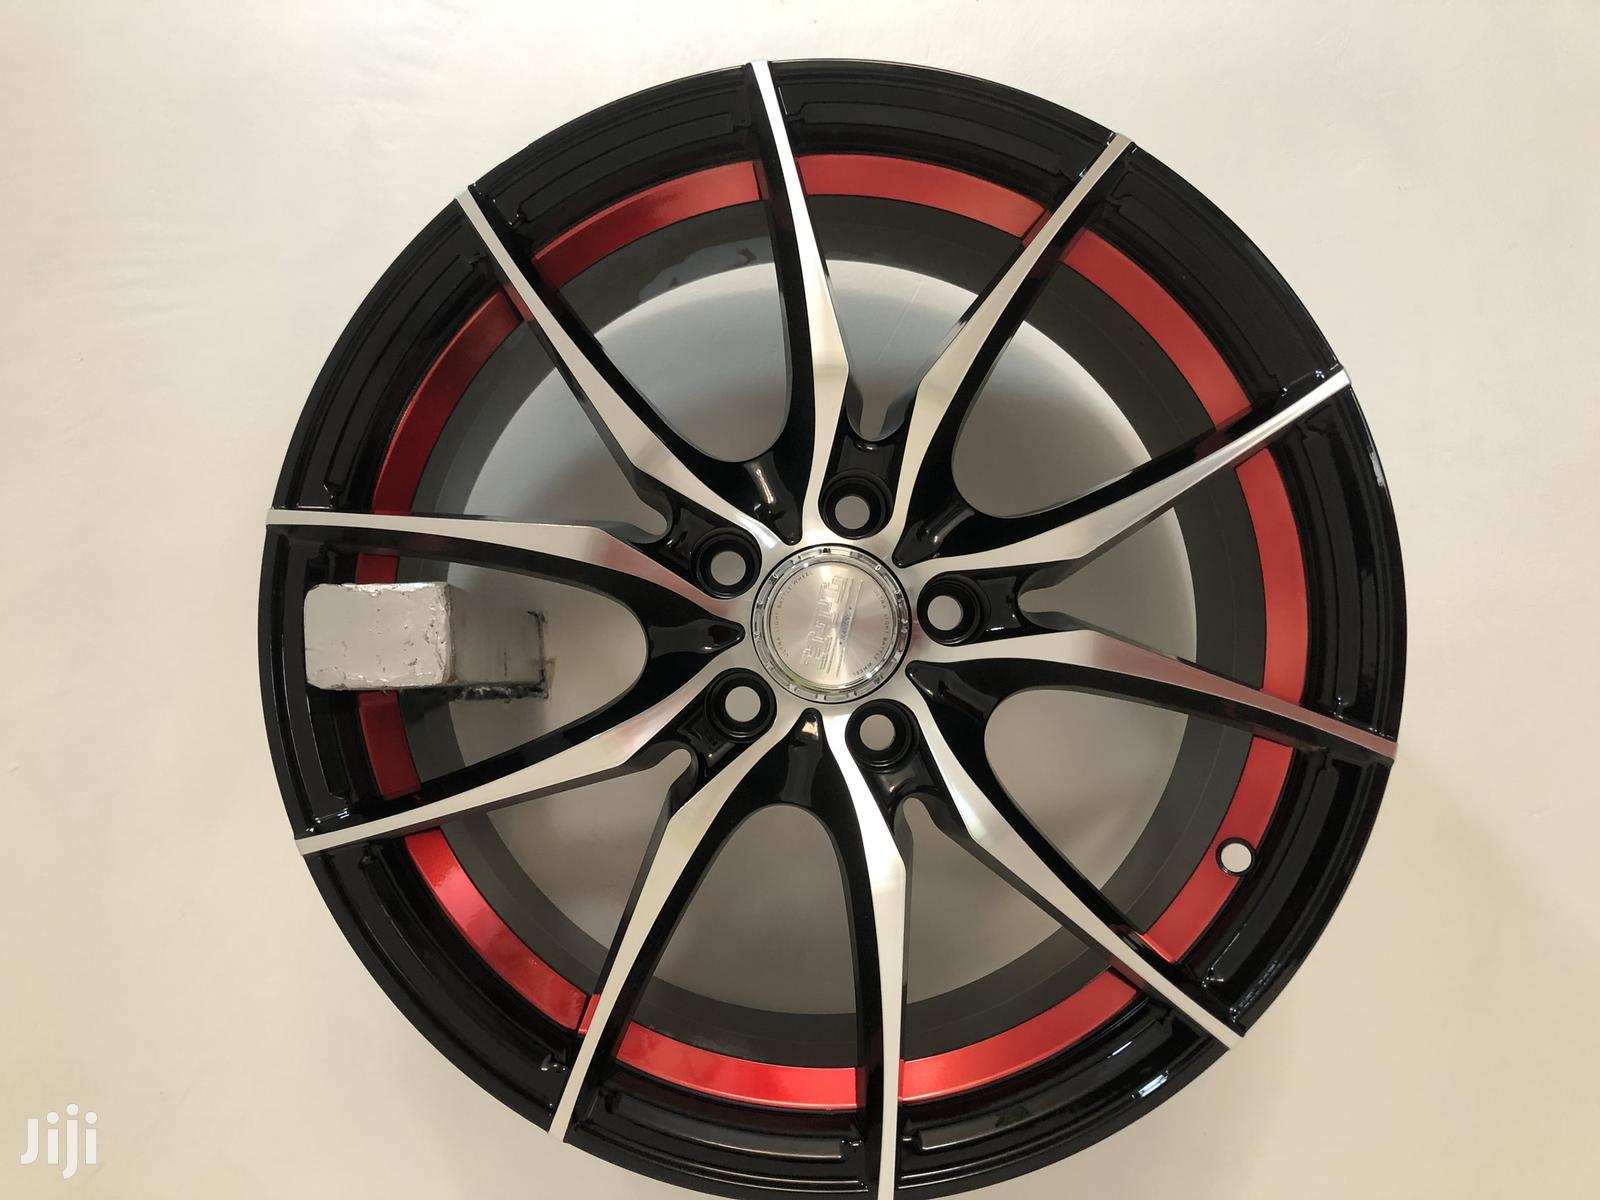 Corolla Alloy Rims,Matrix Alloy Rims,Golf4 Alloy Rims